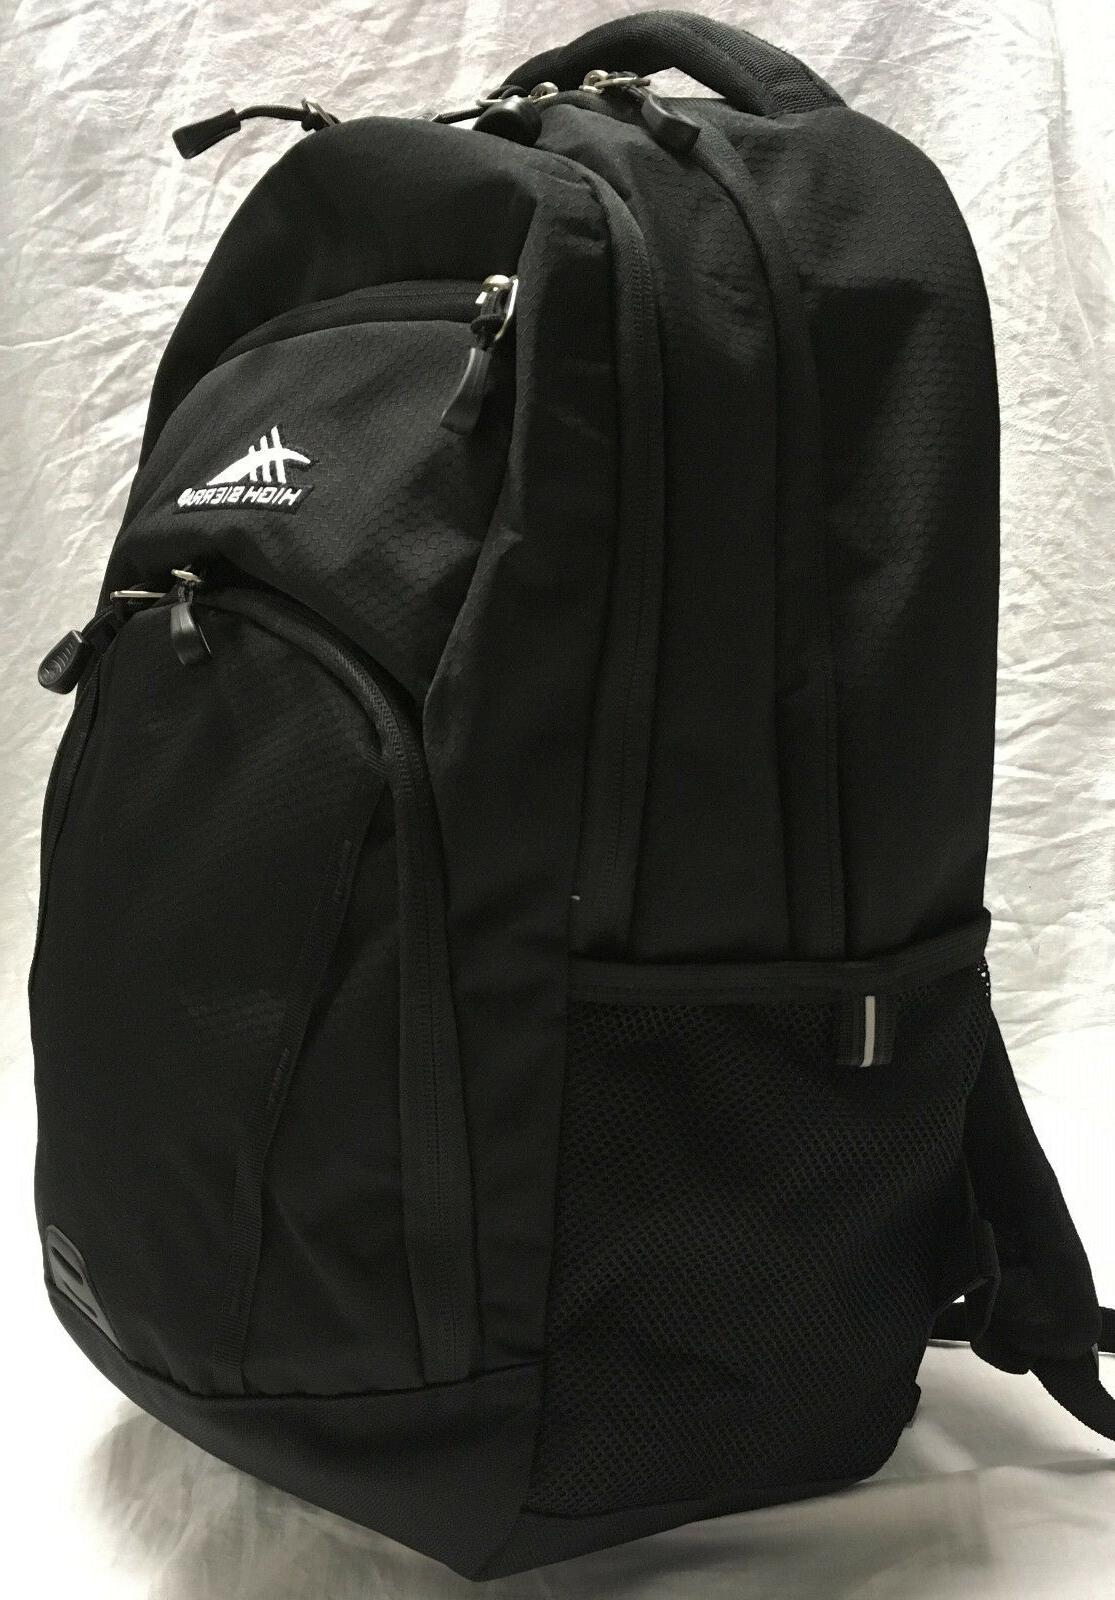 NEW High Sierra Laptop Backpack Everyday RIPRAP Black Organi